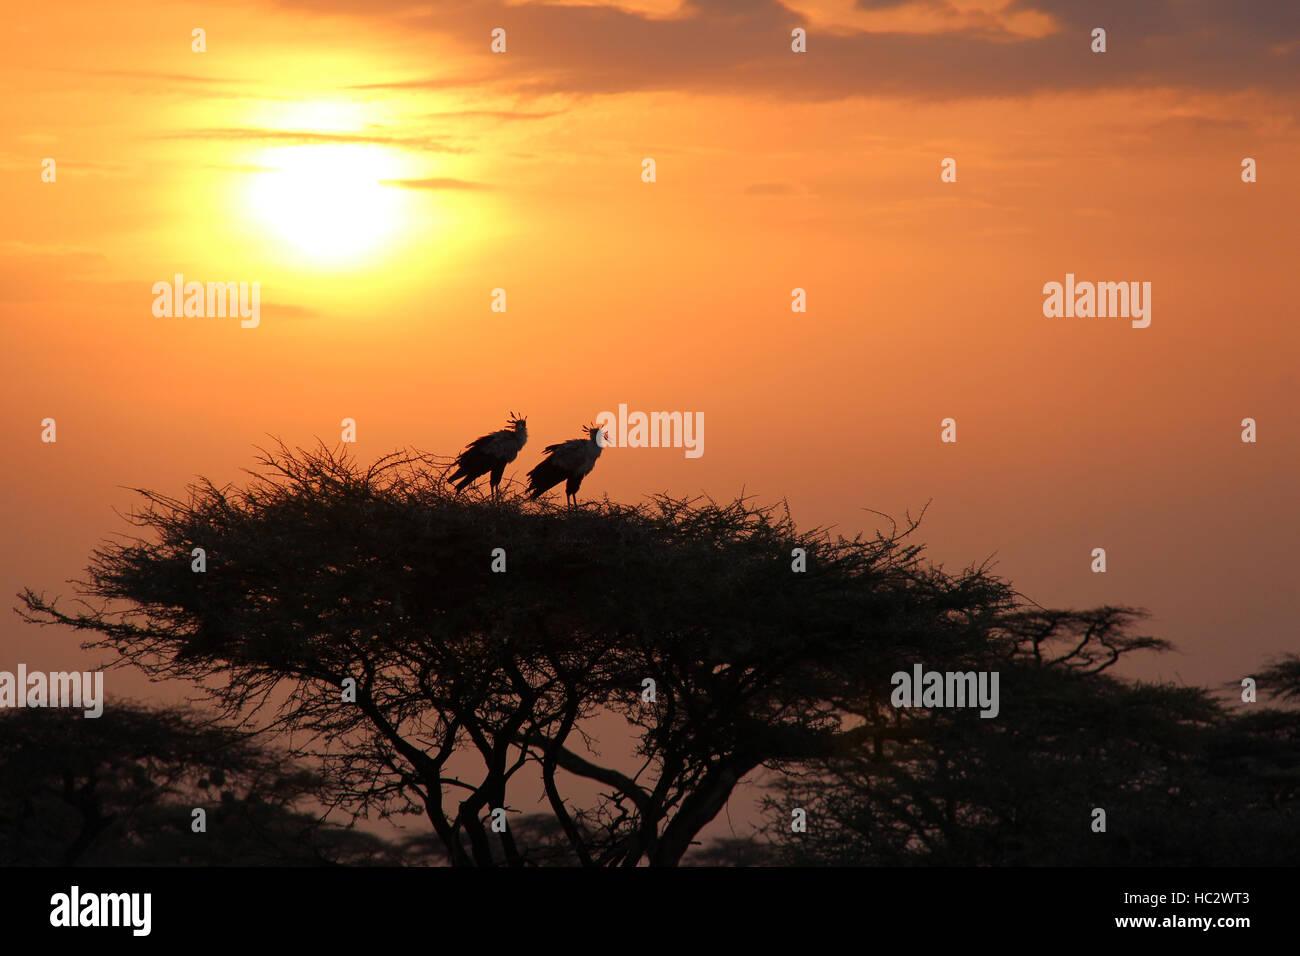 Two African Secretary Birds (sagittarius serpentarius) in Treetop During Sunrise - Stock Image